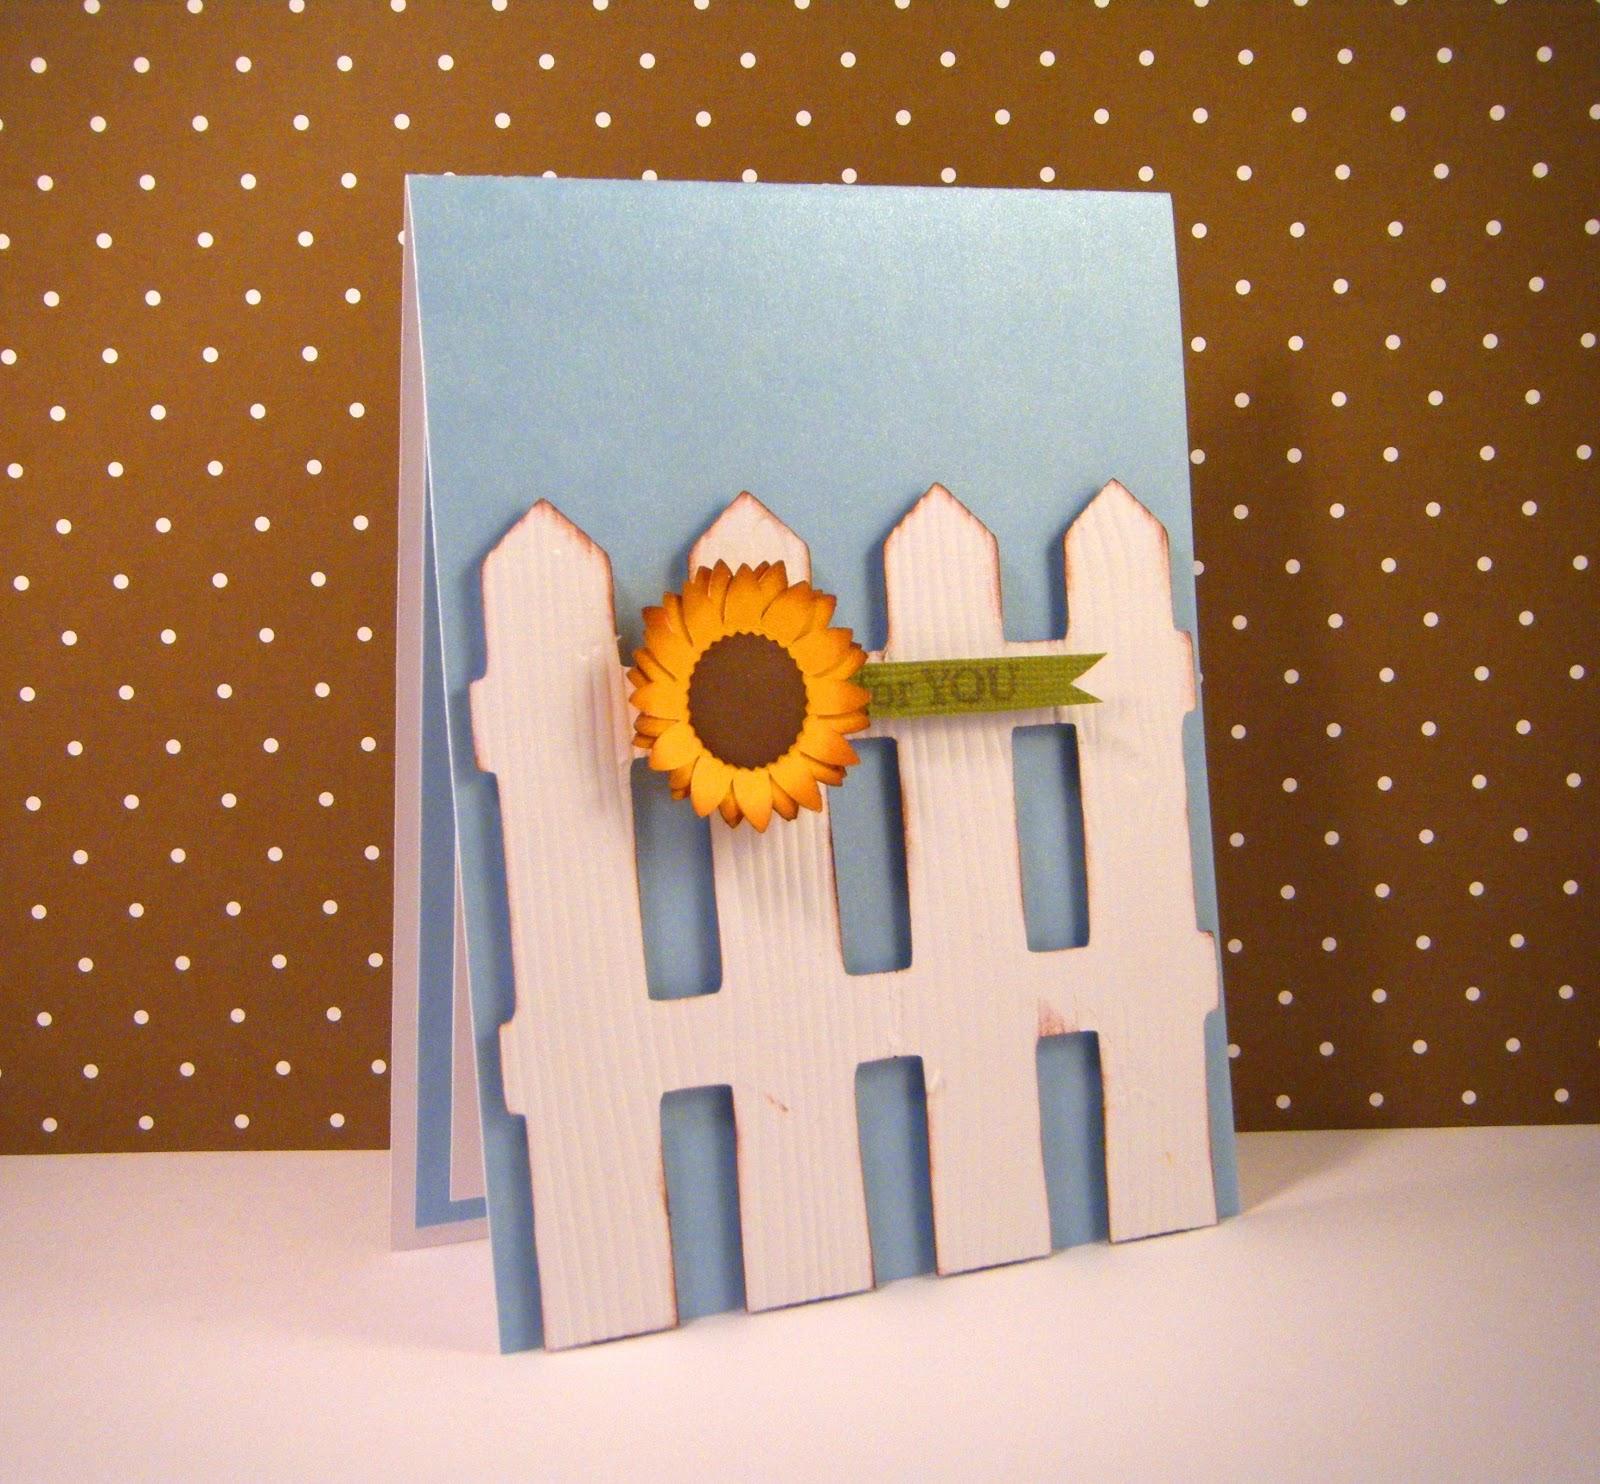 http://4.bp.blogspot.com/-OTUiQk2nKk0/UHXCFjF-tLI/AAAAAAAAC9E/Zzqmvz_ixrs/s1600/picket+fence+card+side.JPG